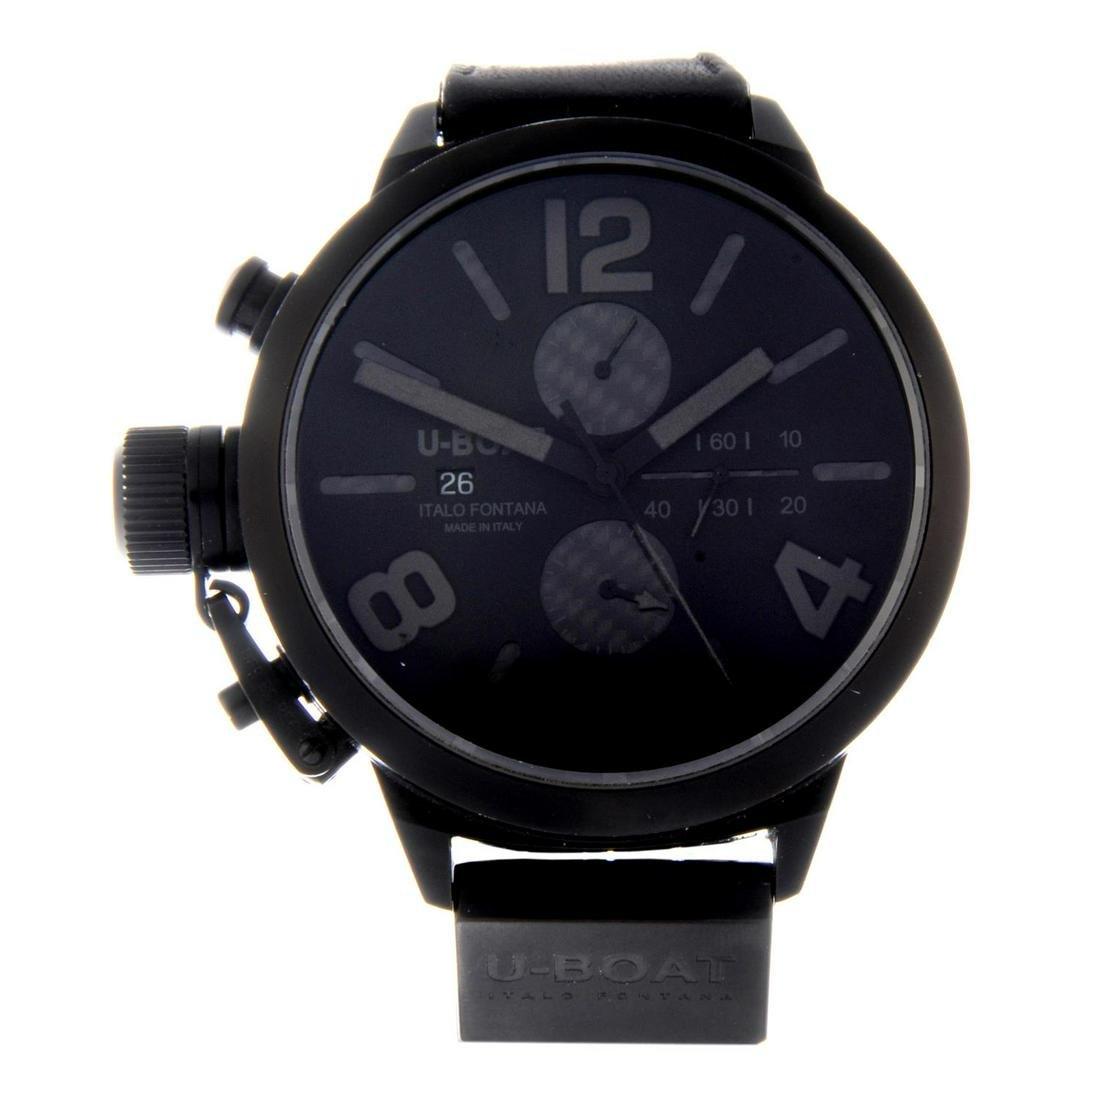 U-BOAT - a gentleman's Classico chronograph wrist